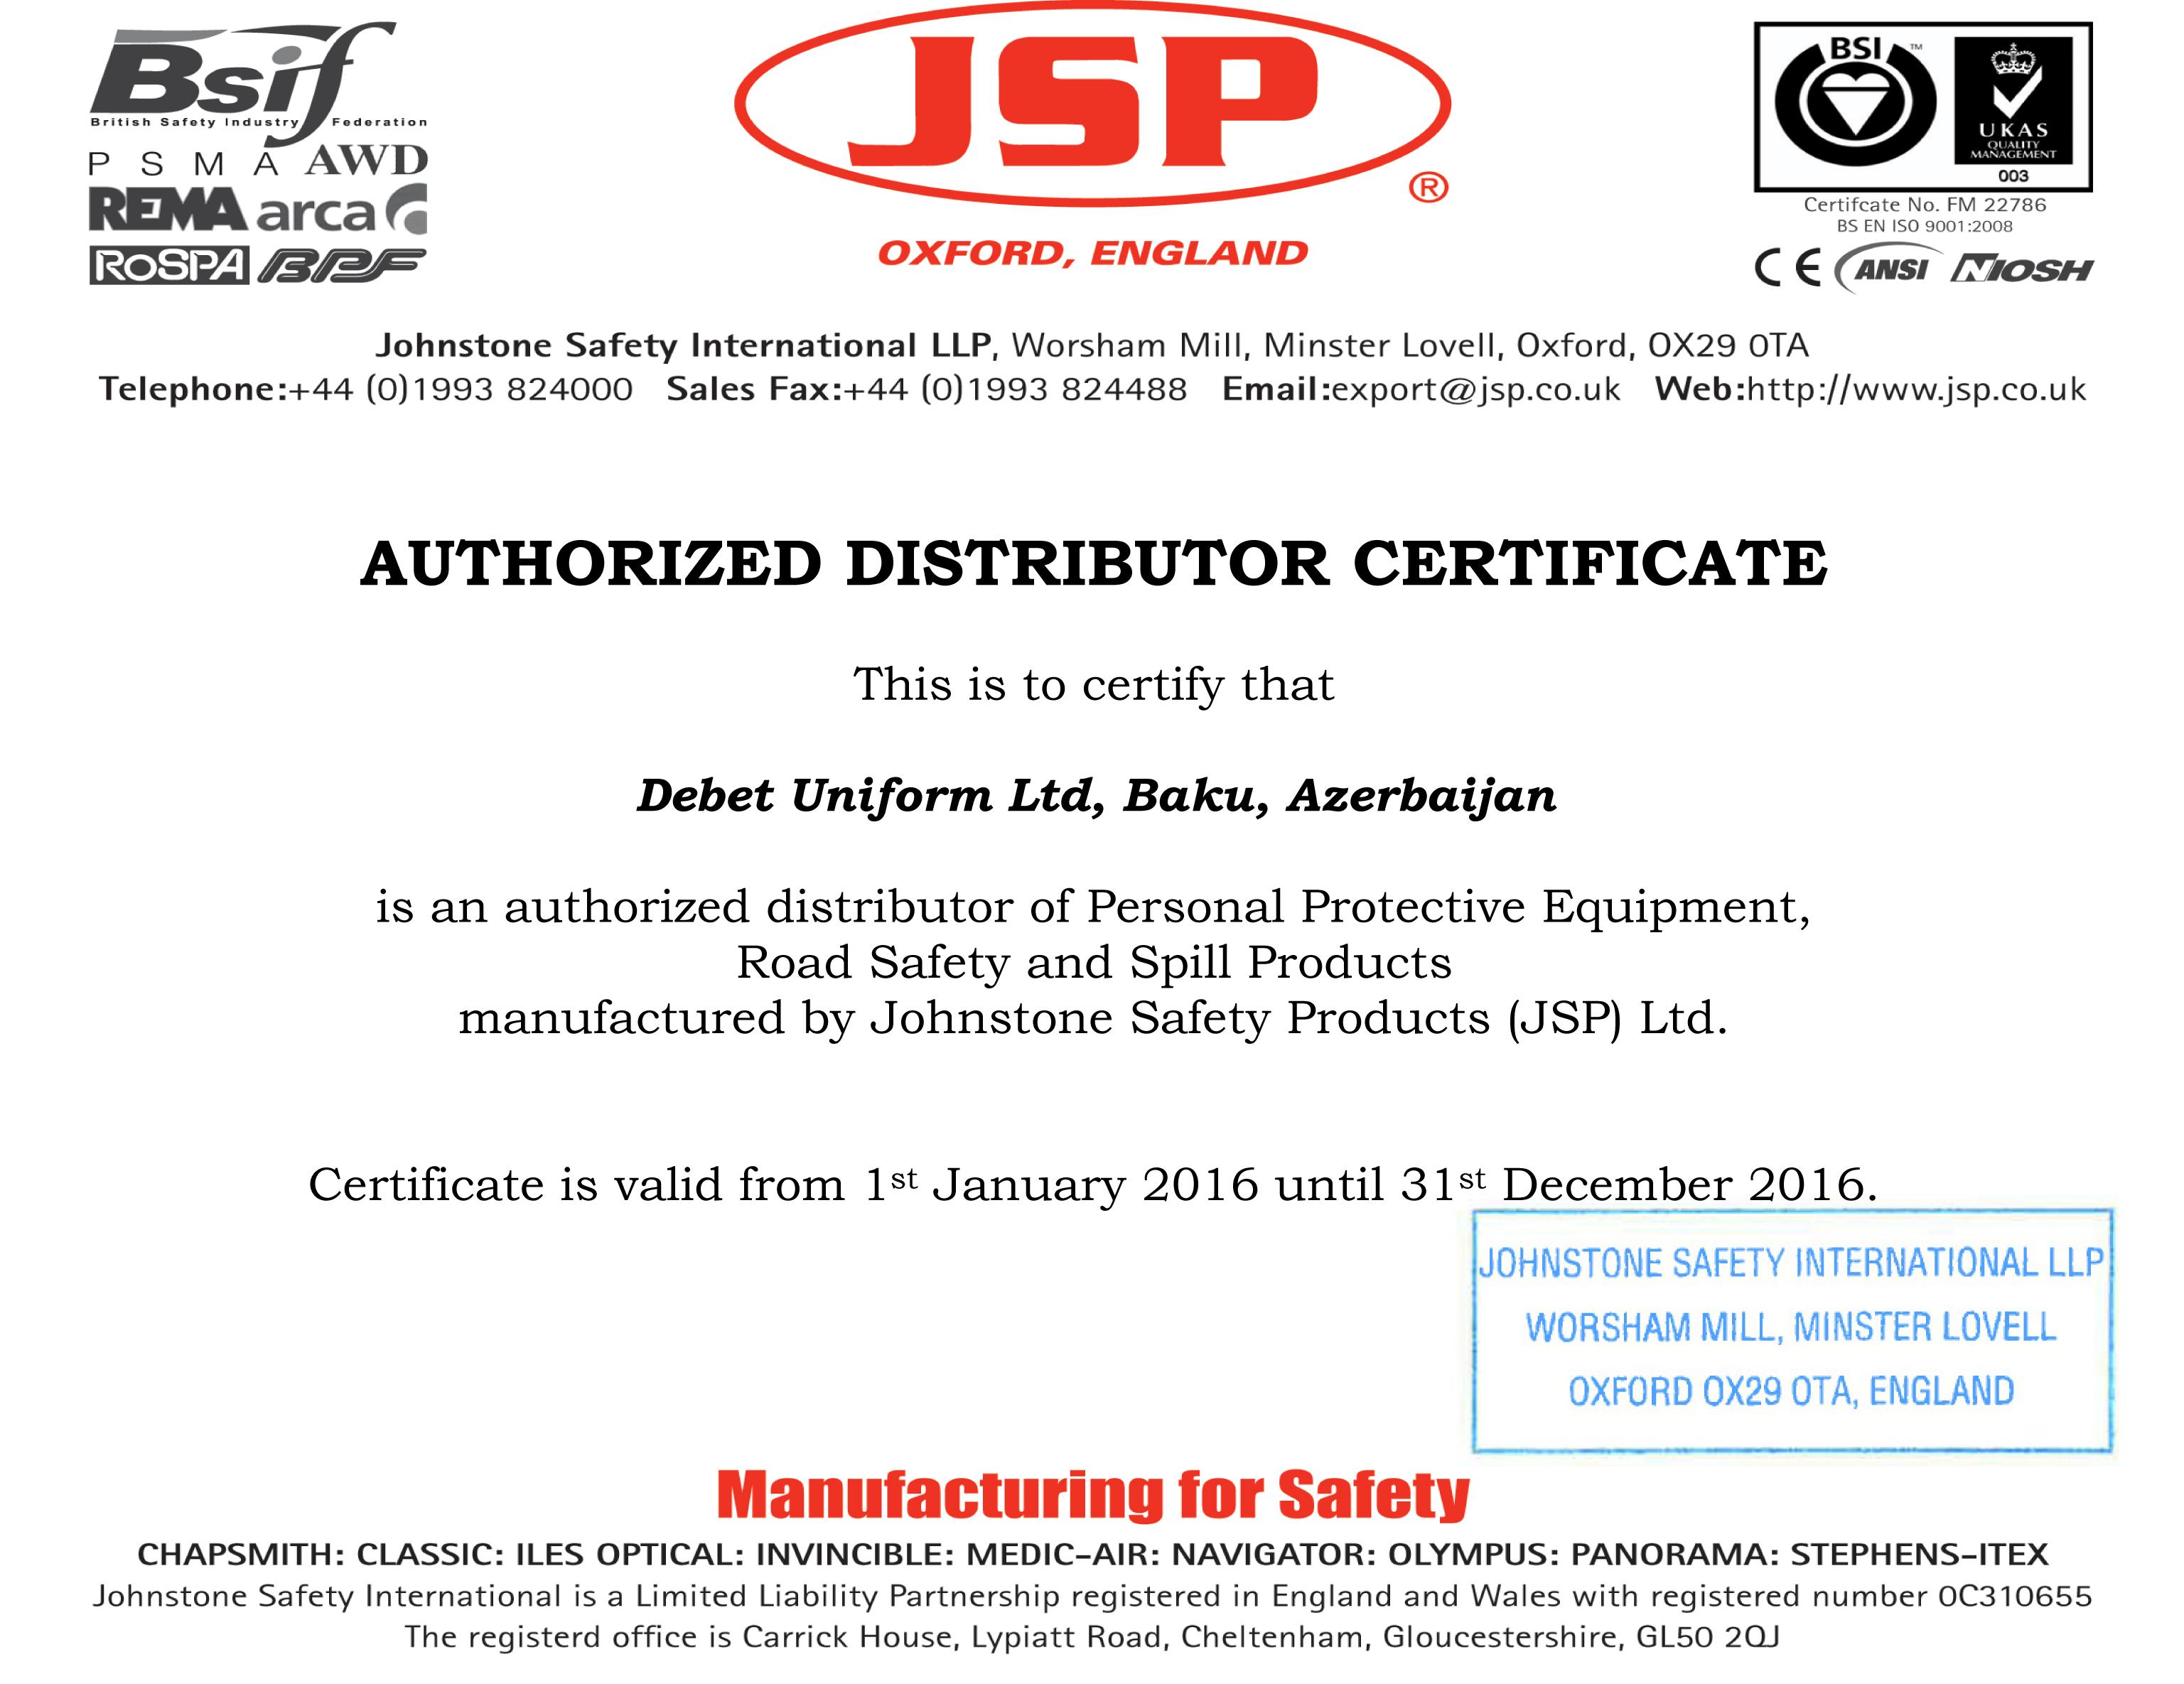 Jsp has prolonged the distributor certificate with debet uniform jsp has prolonged the distributor certificate with debet uniform till the end of 2016 altavistaventures Choice Image